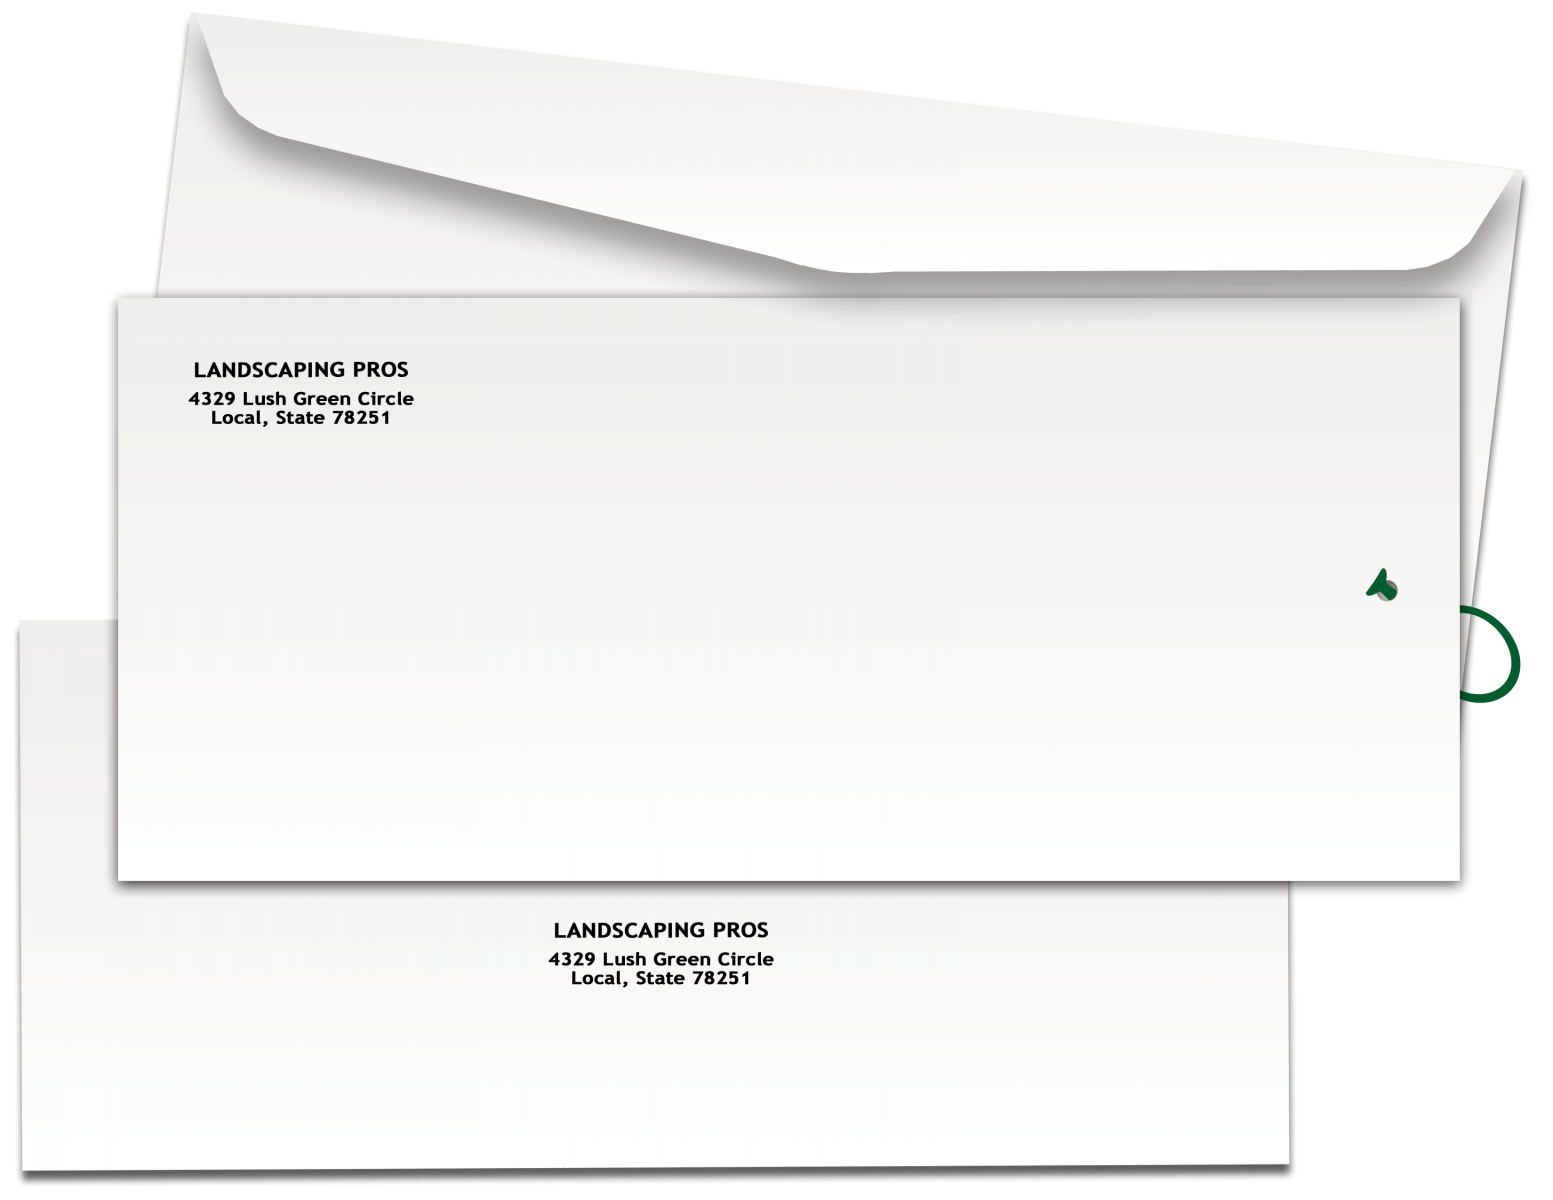 Door hangers envelopes hanger. Envelope clipart envelope design